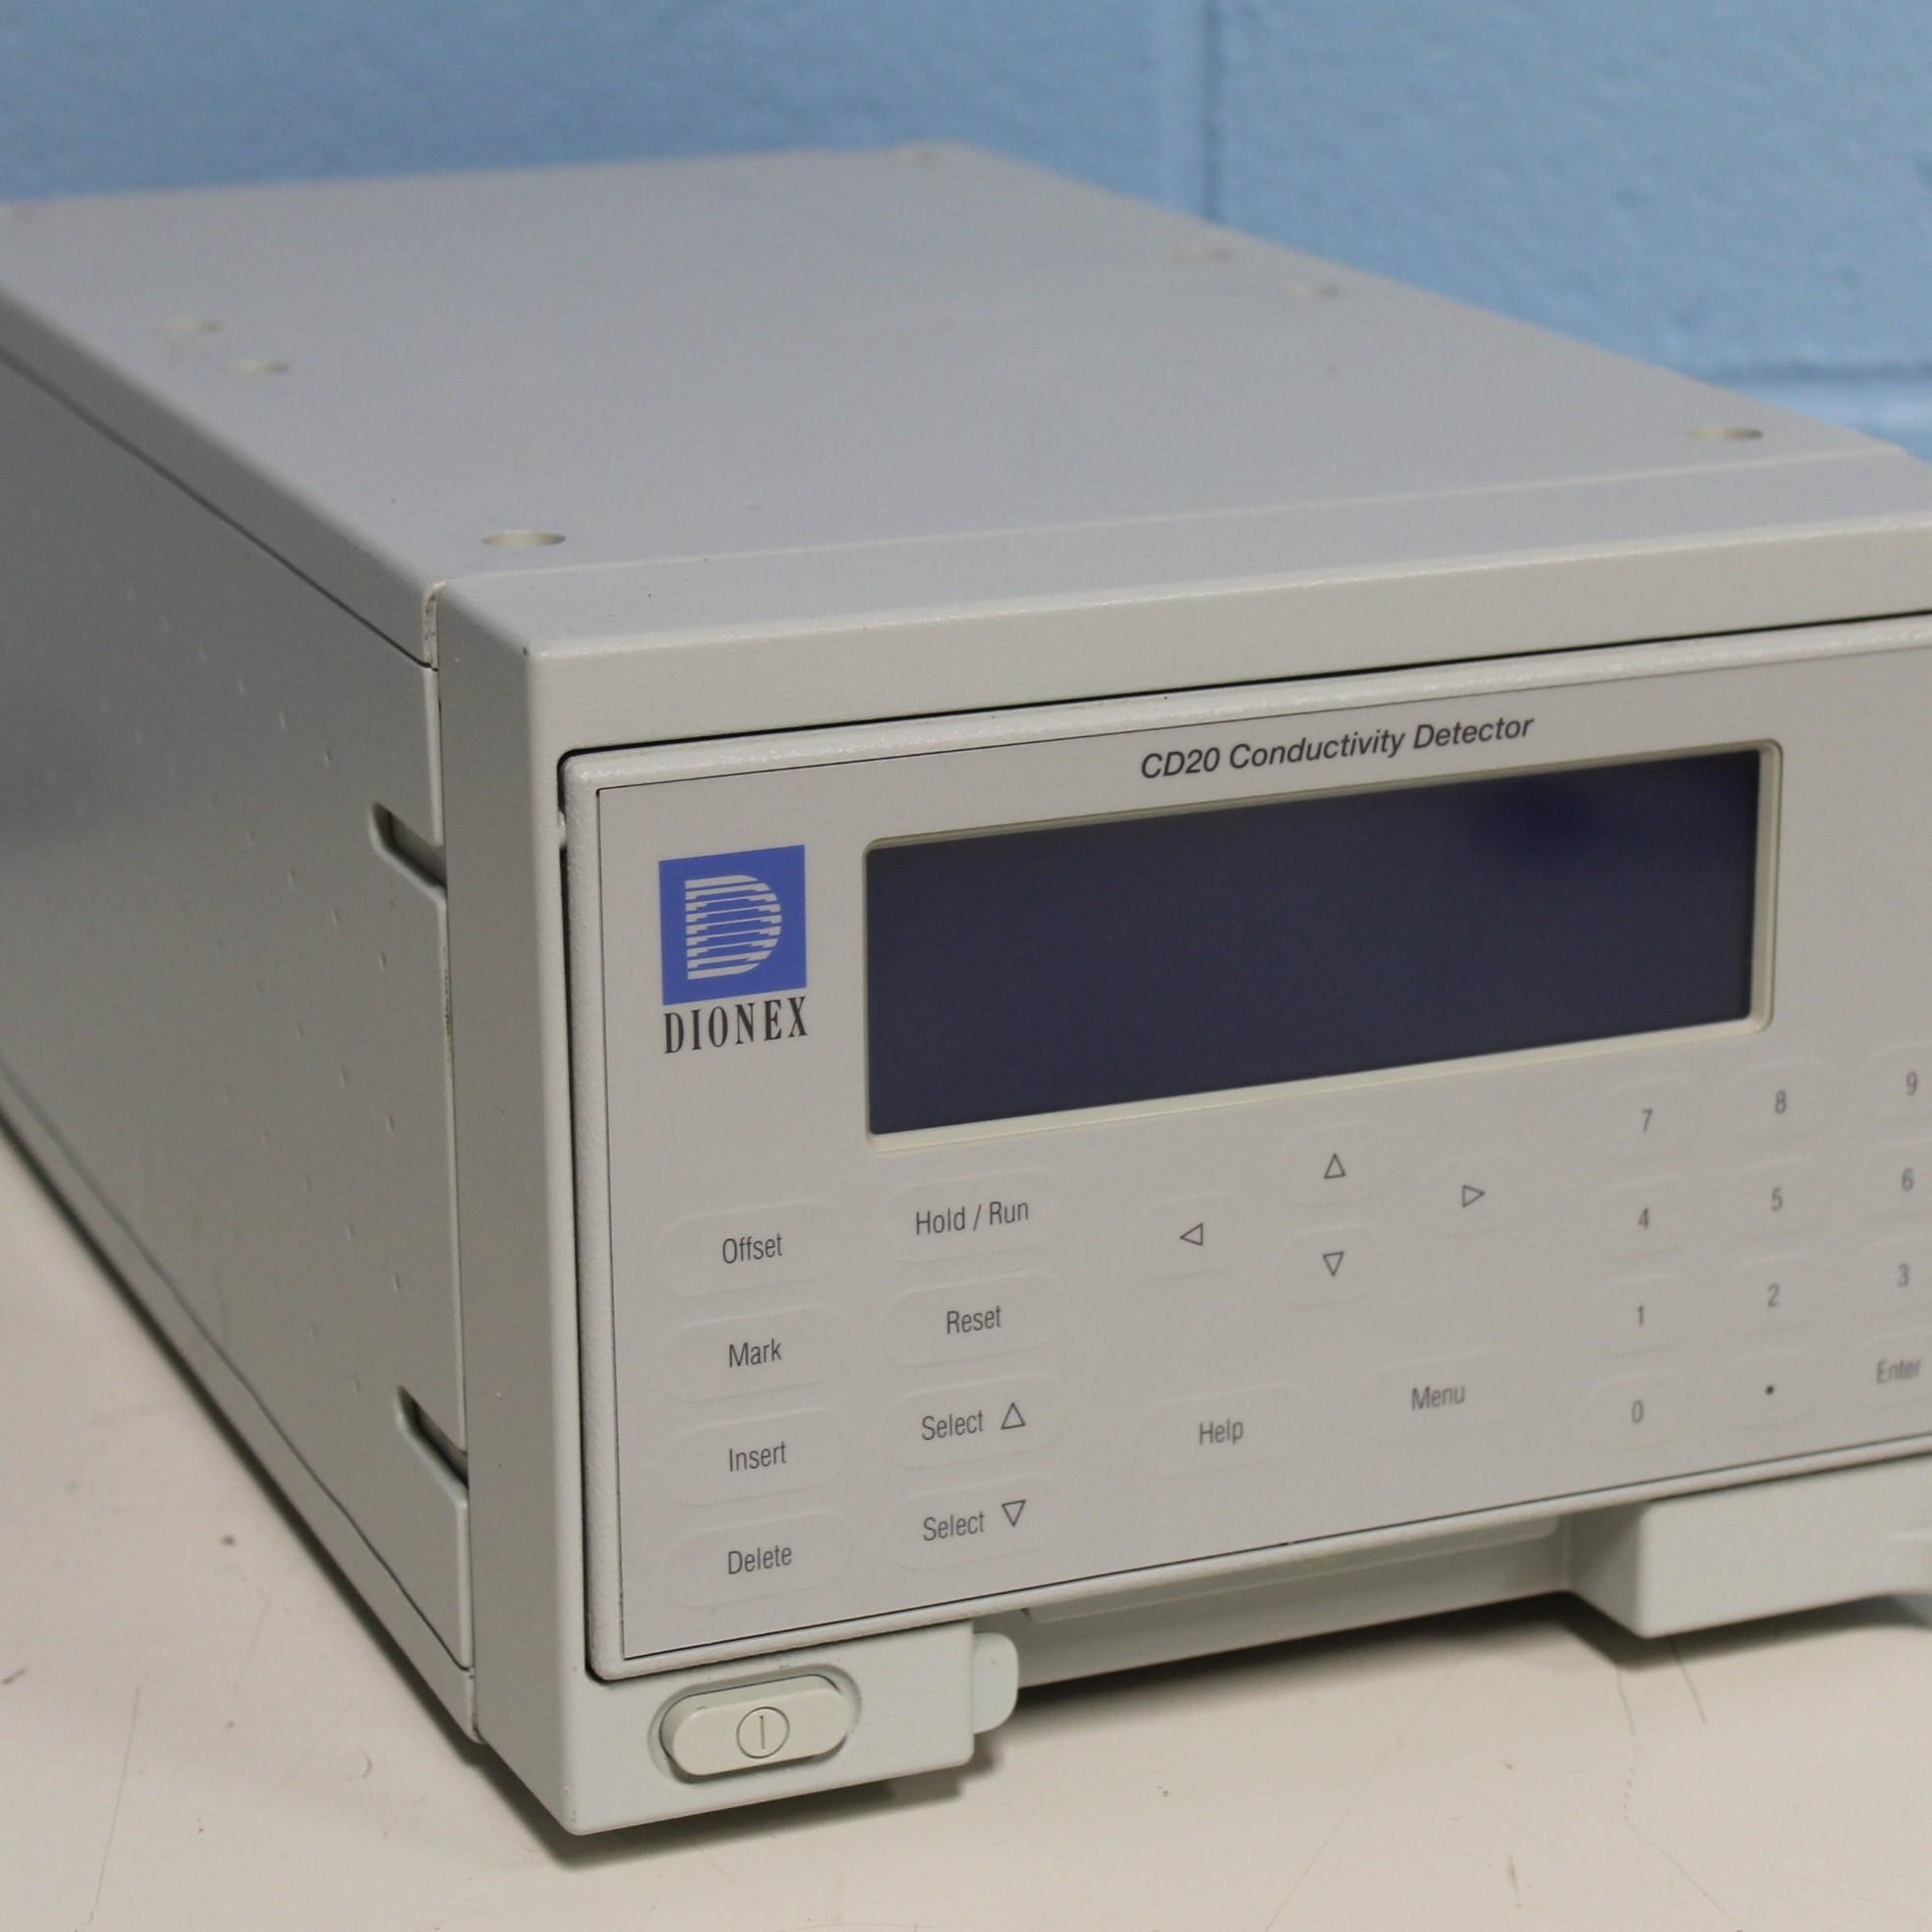 Dionex CD20 Conductivity Detector Image